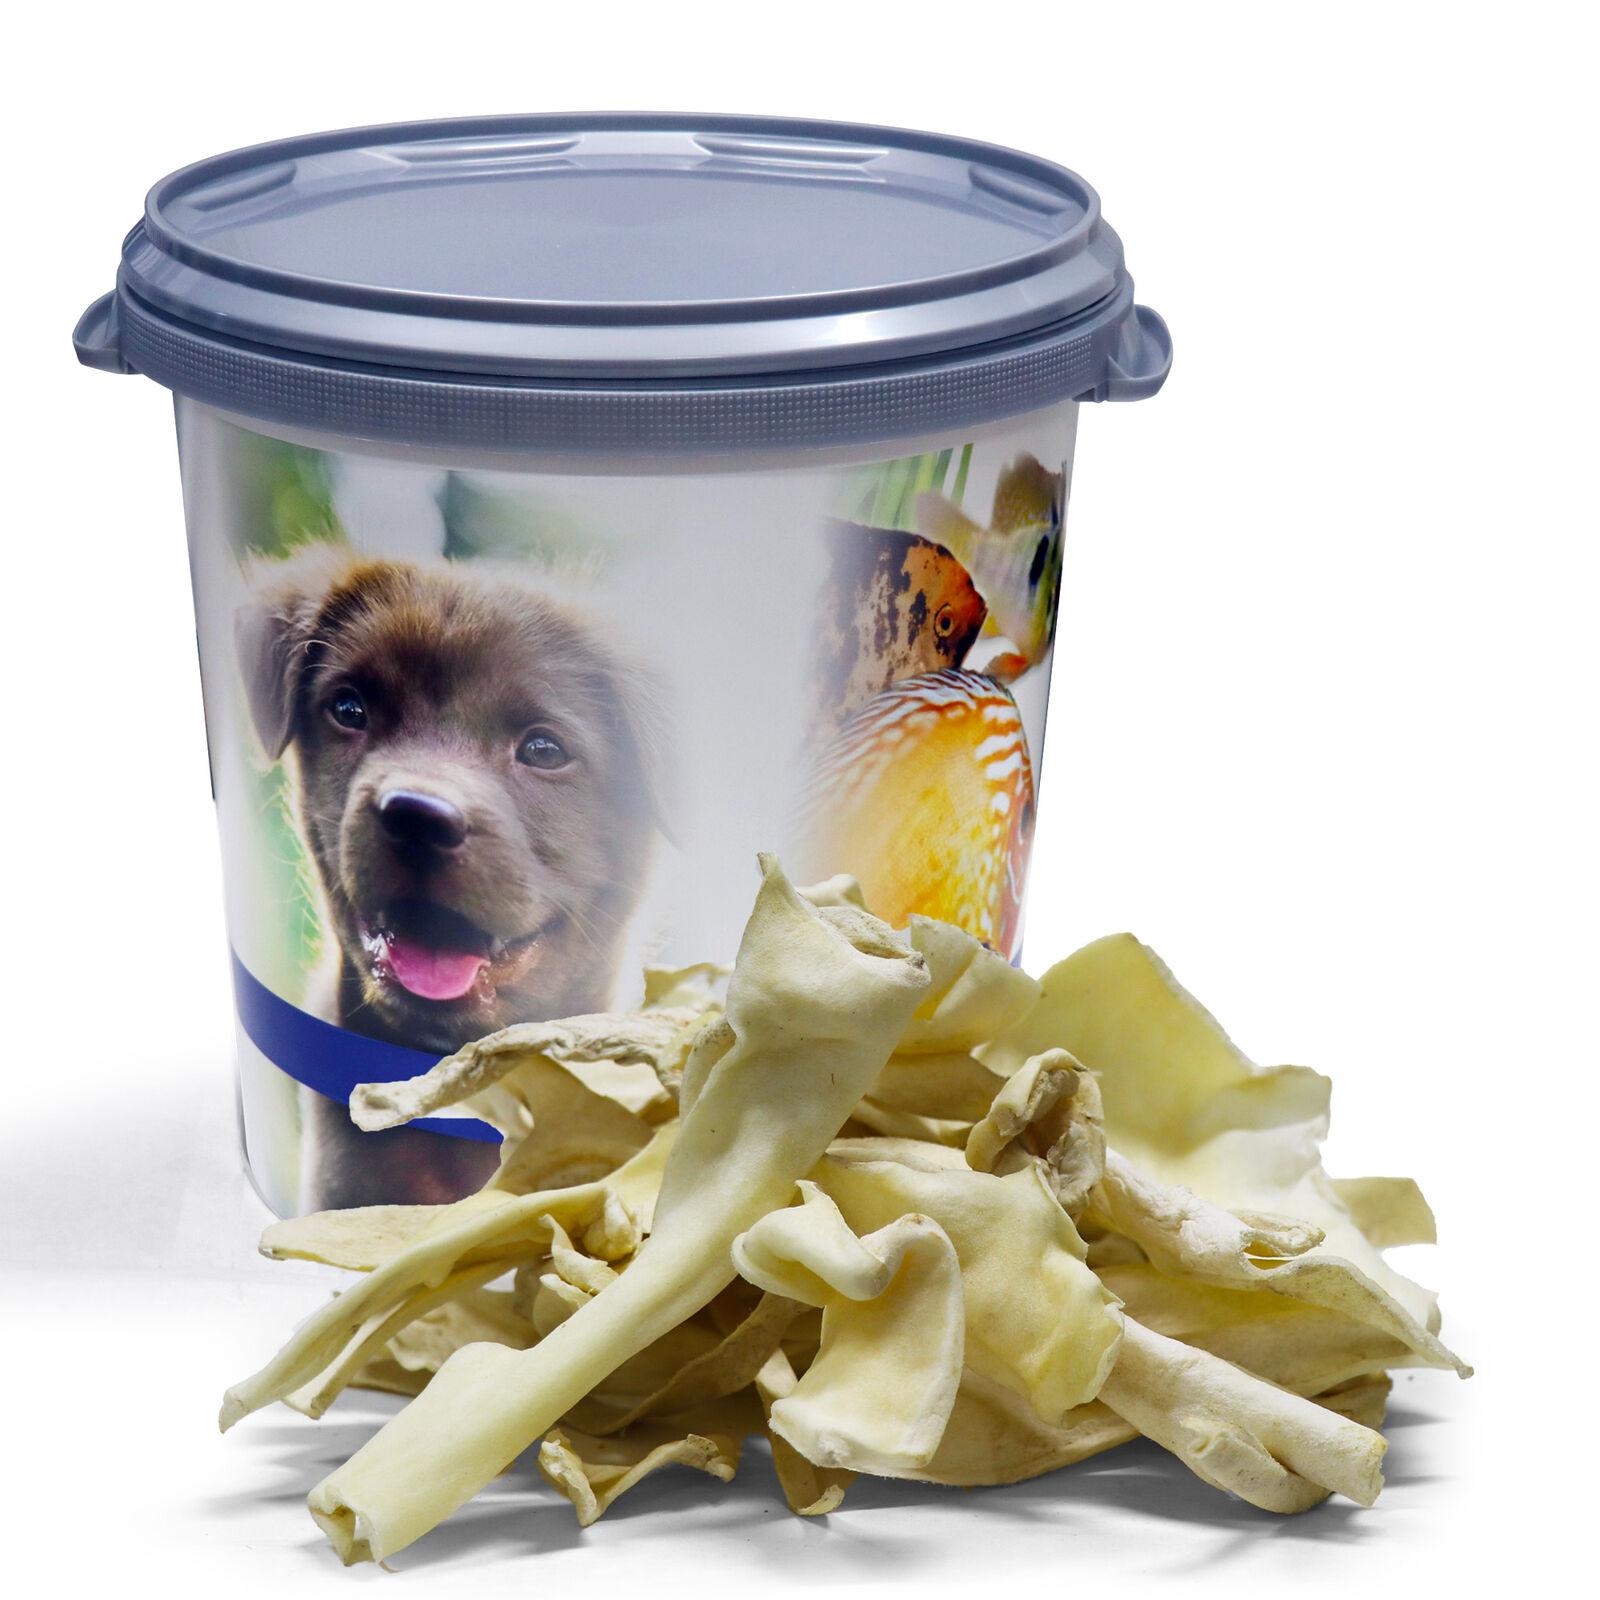 10 kg Lammkopfhaut 10000 g getrocknet für Hunde Lamm hell Lyra Pet® in 30L Tonne